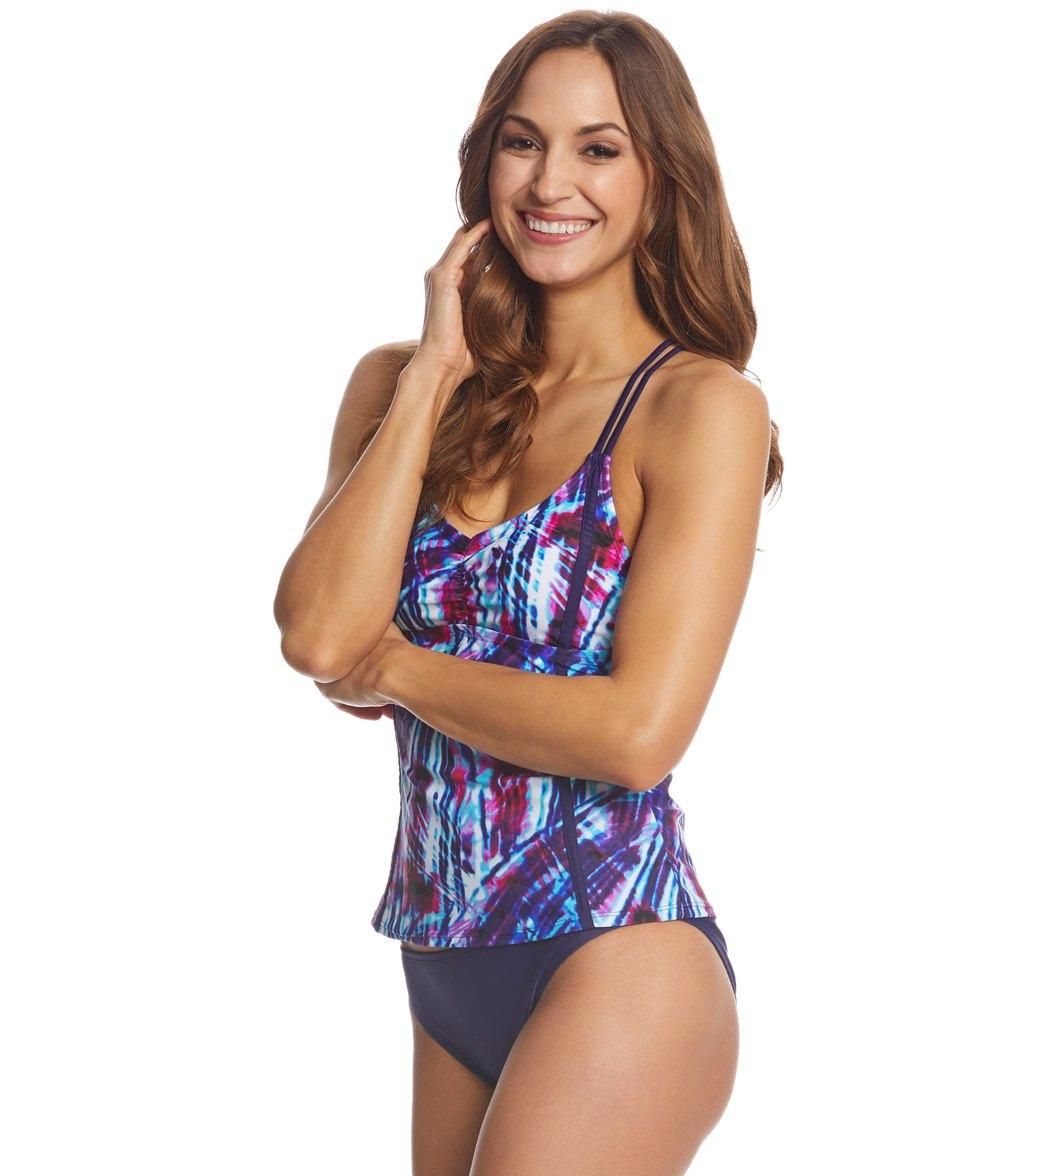 Adidas Mujer eléctrica Palma en Palma Strappy Adidas Criss Cross Tankini en 3c6cf14 - sfitness.xyz